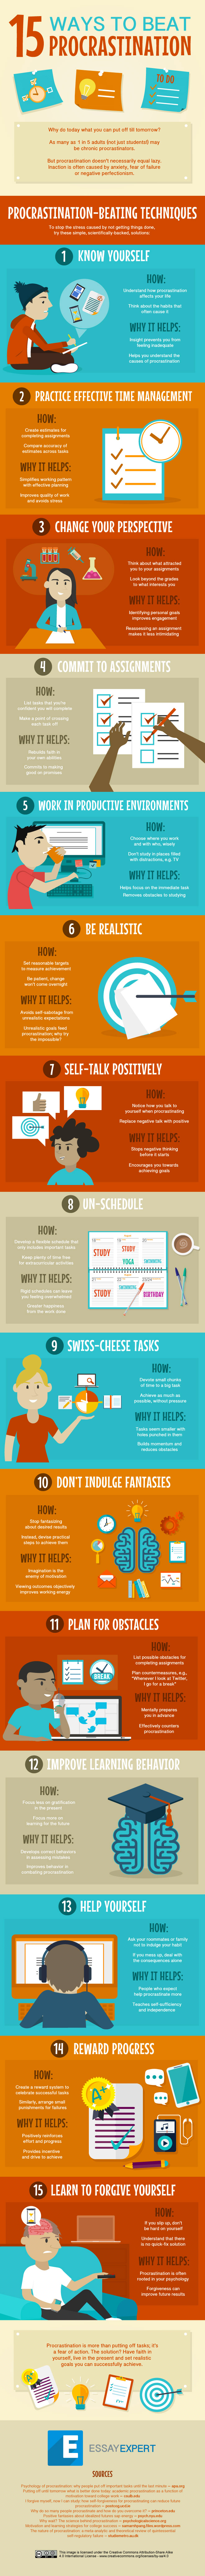 Ways-to-Stop-Procrastination